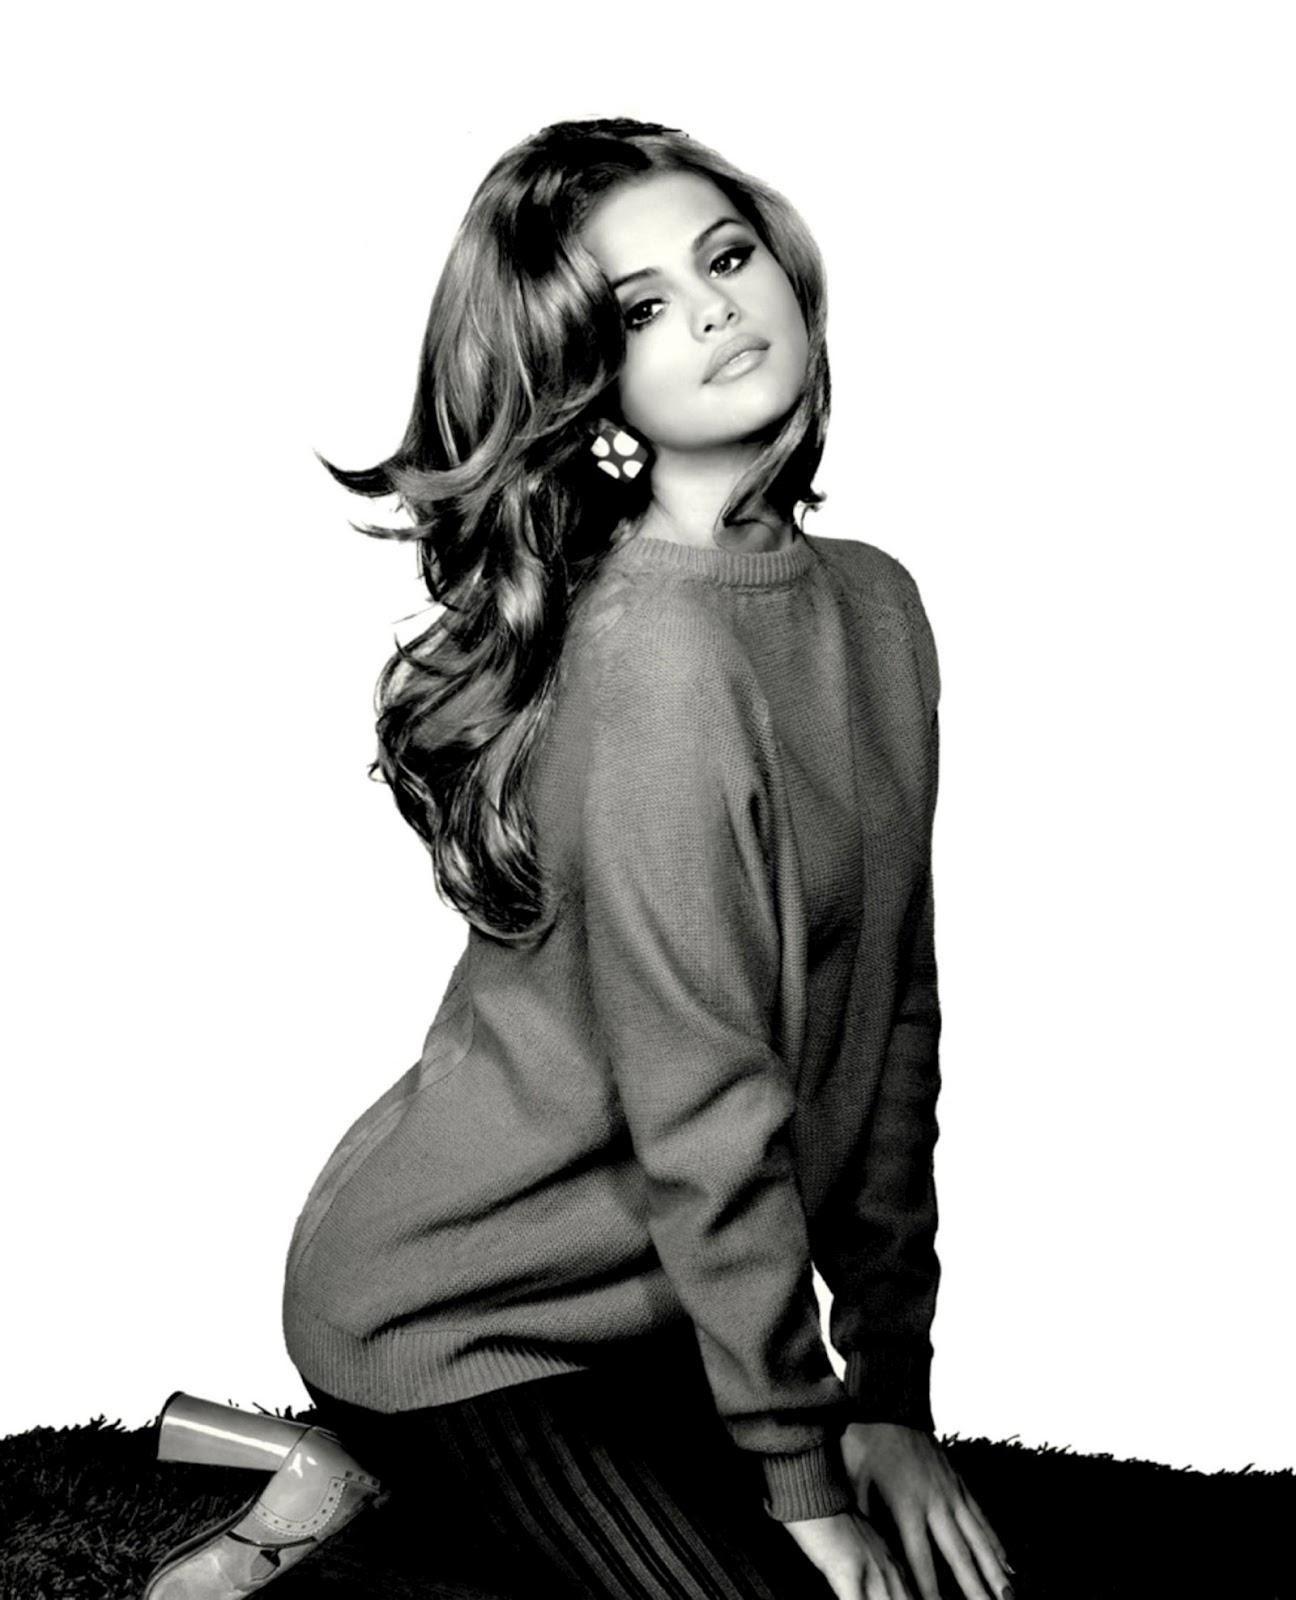 http://1.bp.blogspot.com/-iPhvUJIzkS4/TzJ1MnWZ2fI/AAAAAAAAAfY/qYnEOUXnkLw/s1600/Selena-Gomez-%E2%80%93-%E2%80%9CWhen-The-Sun-Goes-Down%E2%80%9D-Album-Photoshoot-3.jpg